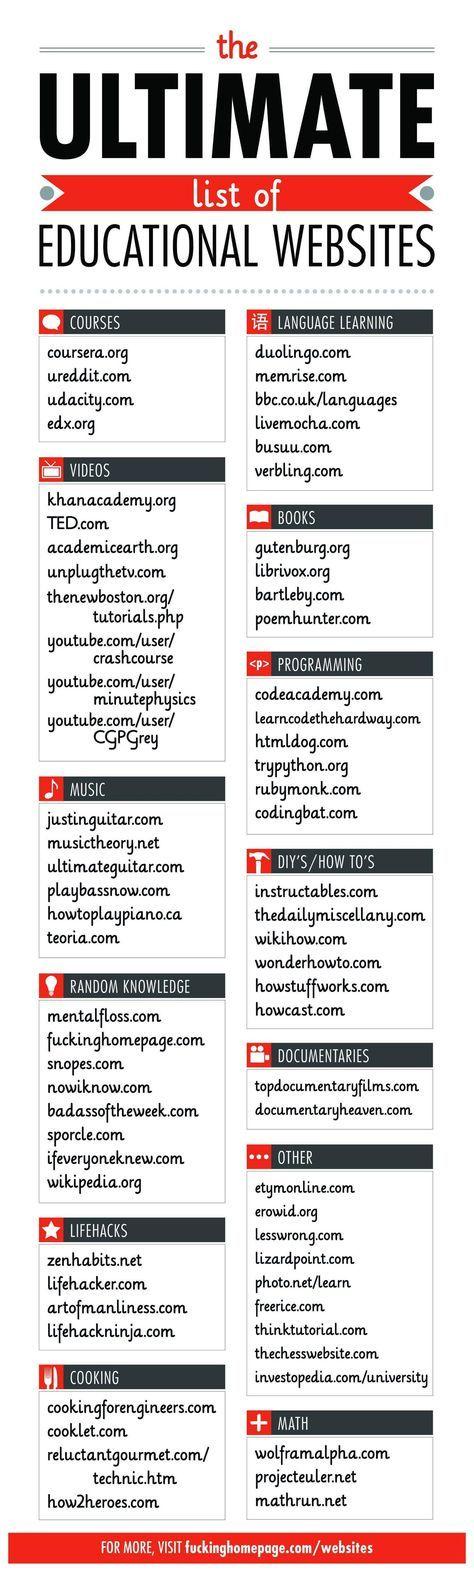 The Ultimate List of Educational Websites via imgur #Infographic #Education #Websites